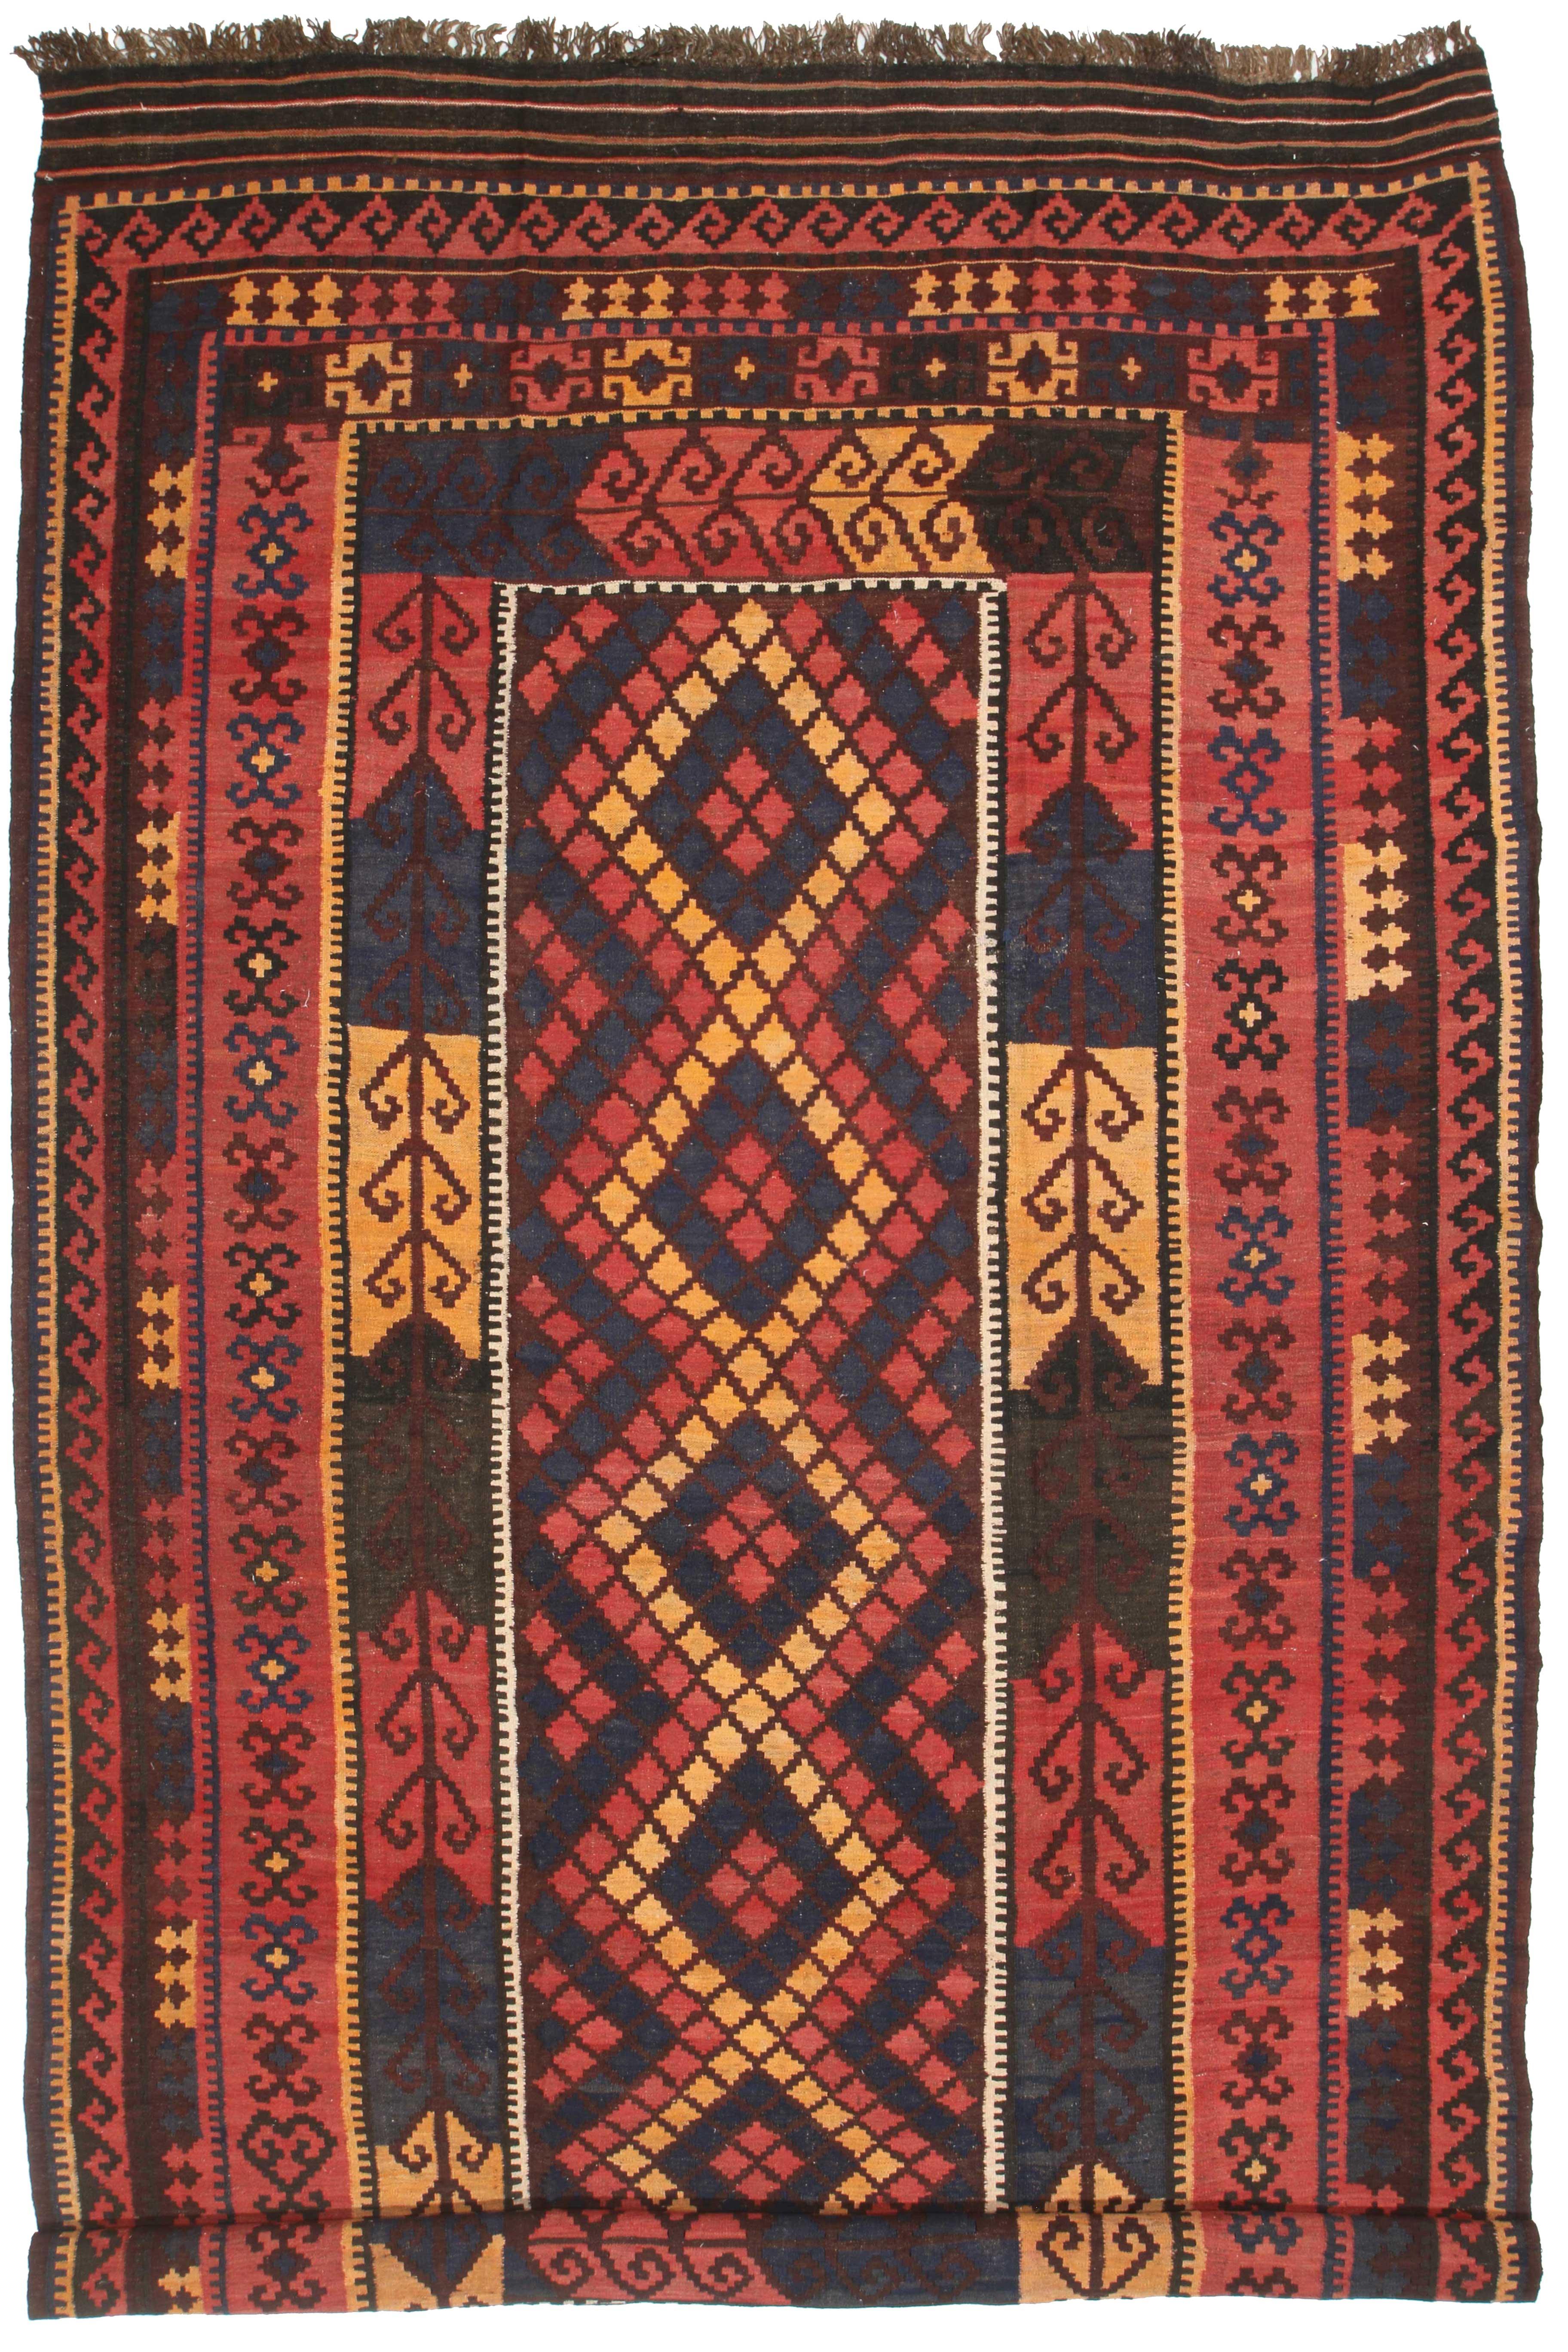 Afghan Wool Kilim 8 X 15 Flat Woven Rug 6411 Exclusive